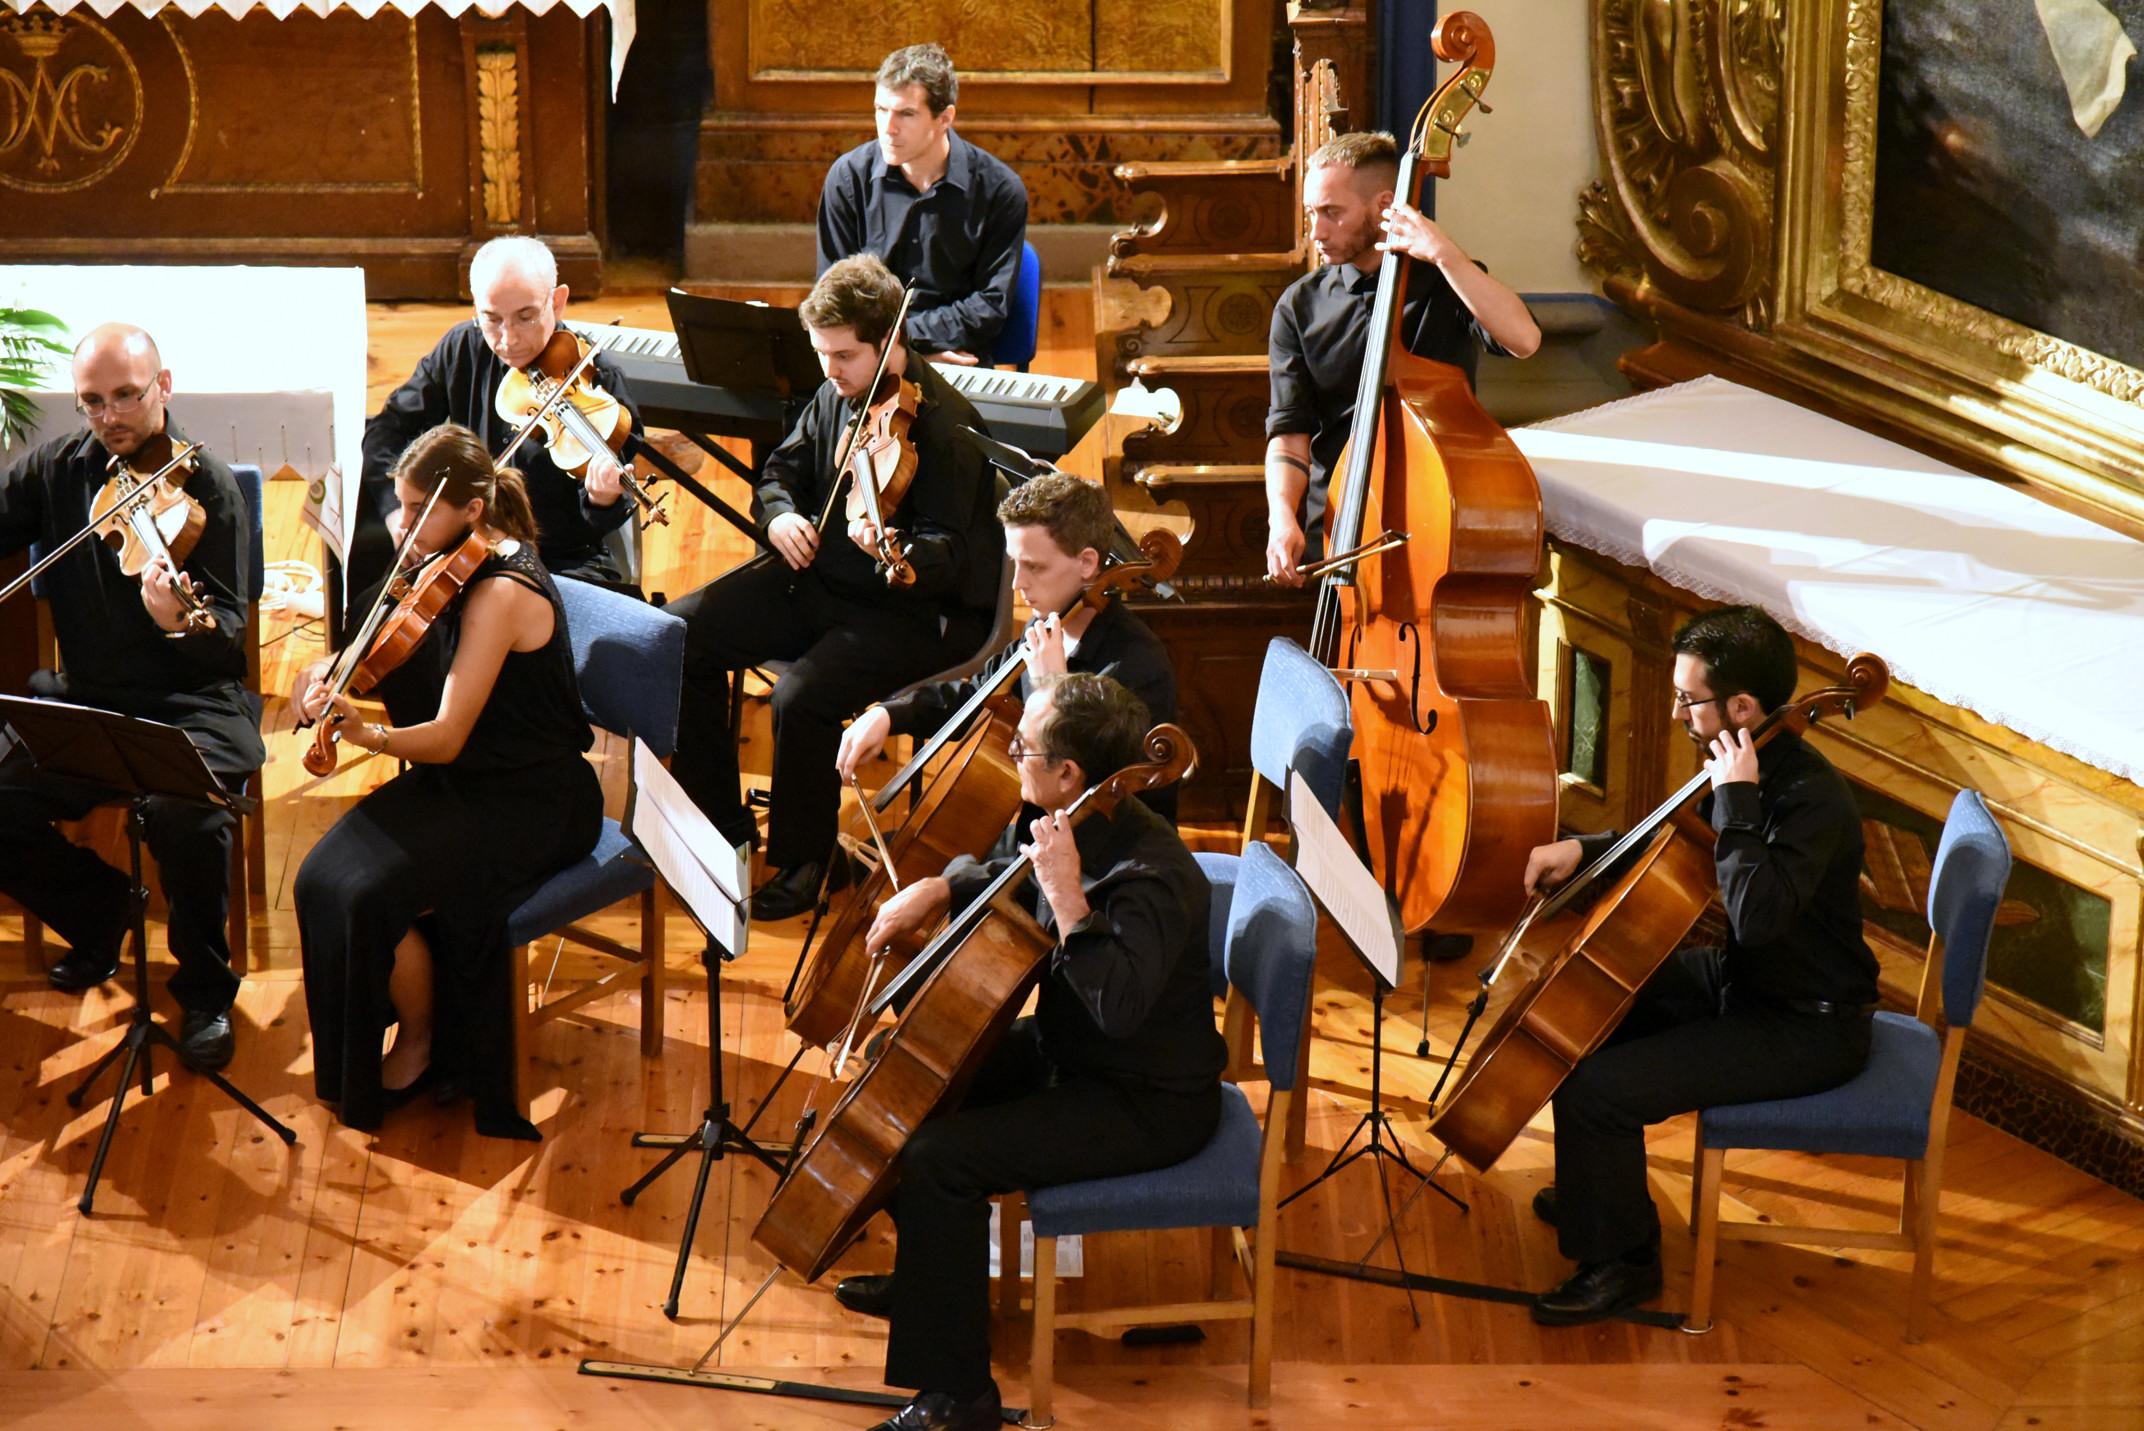 http://orquestatutti.com/wp/wp-content/uploads/2017/06/DSC_0227_03.jpg